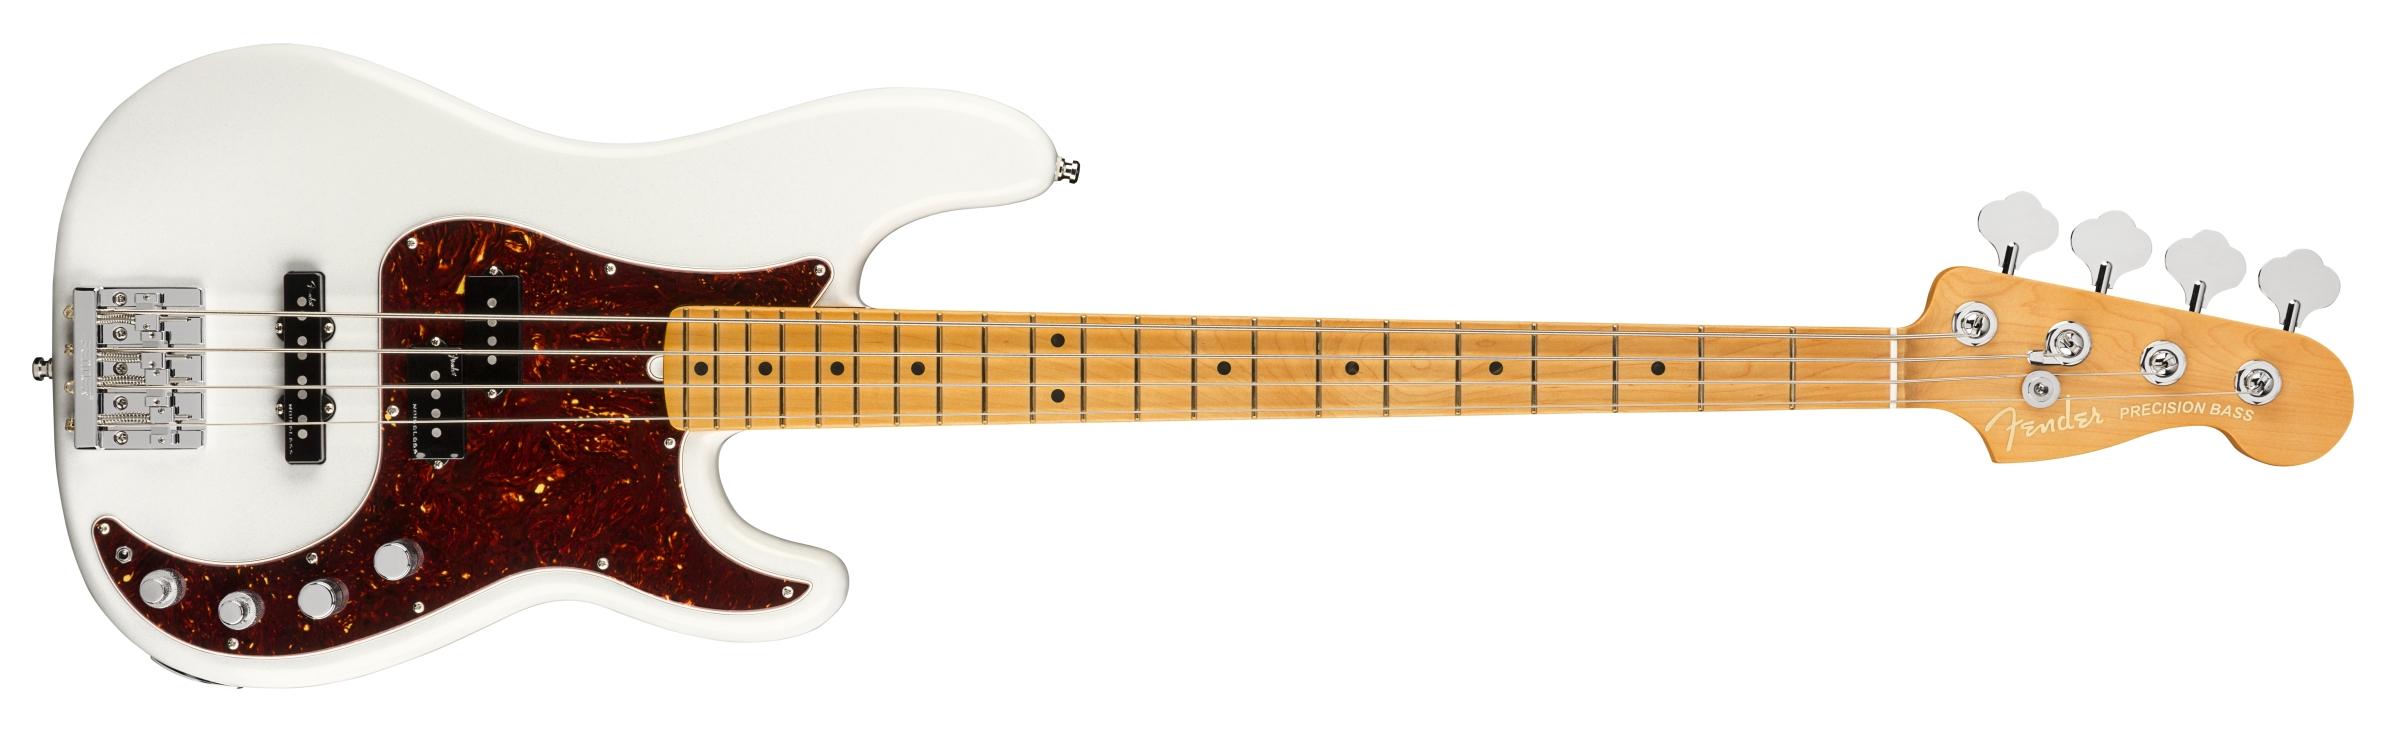 FENDER-American-Ultra-Precision-Bass-MN-Arctic-Pearl-0199012781-sku-24136